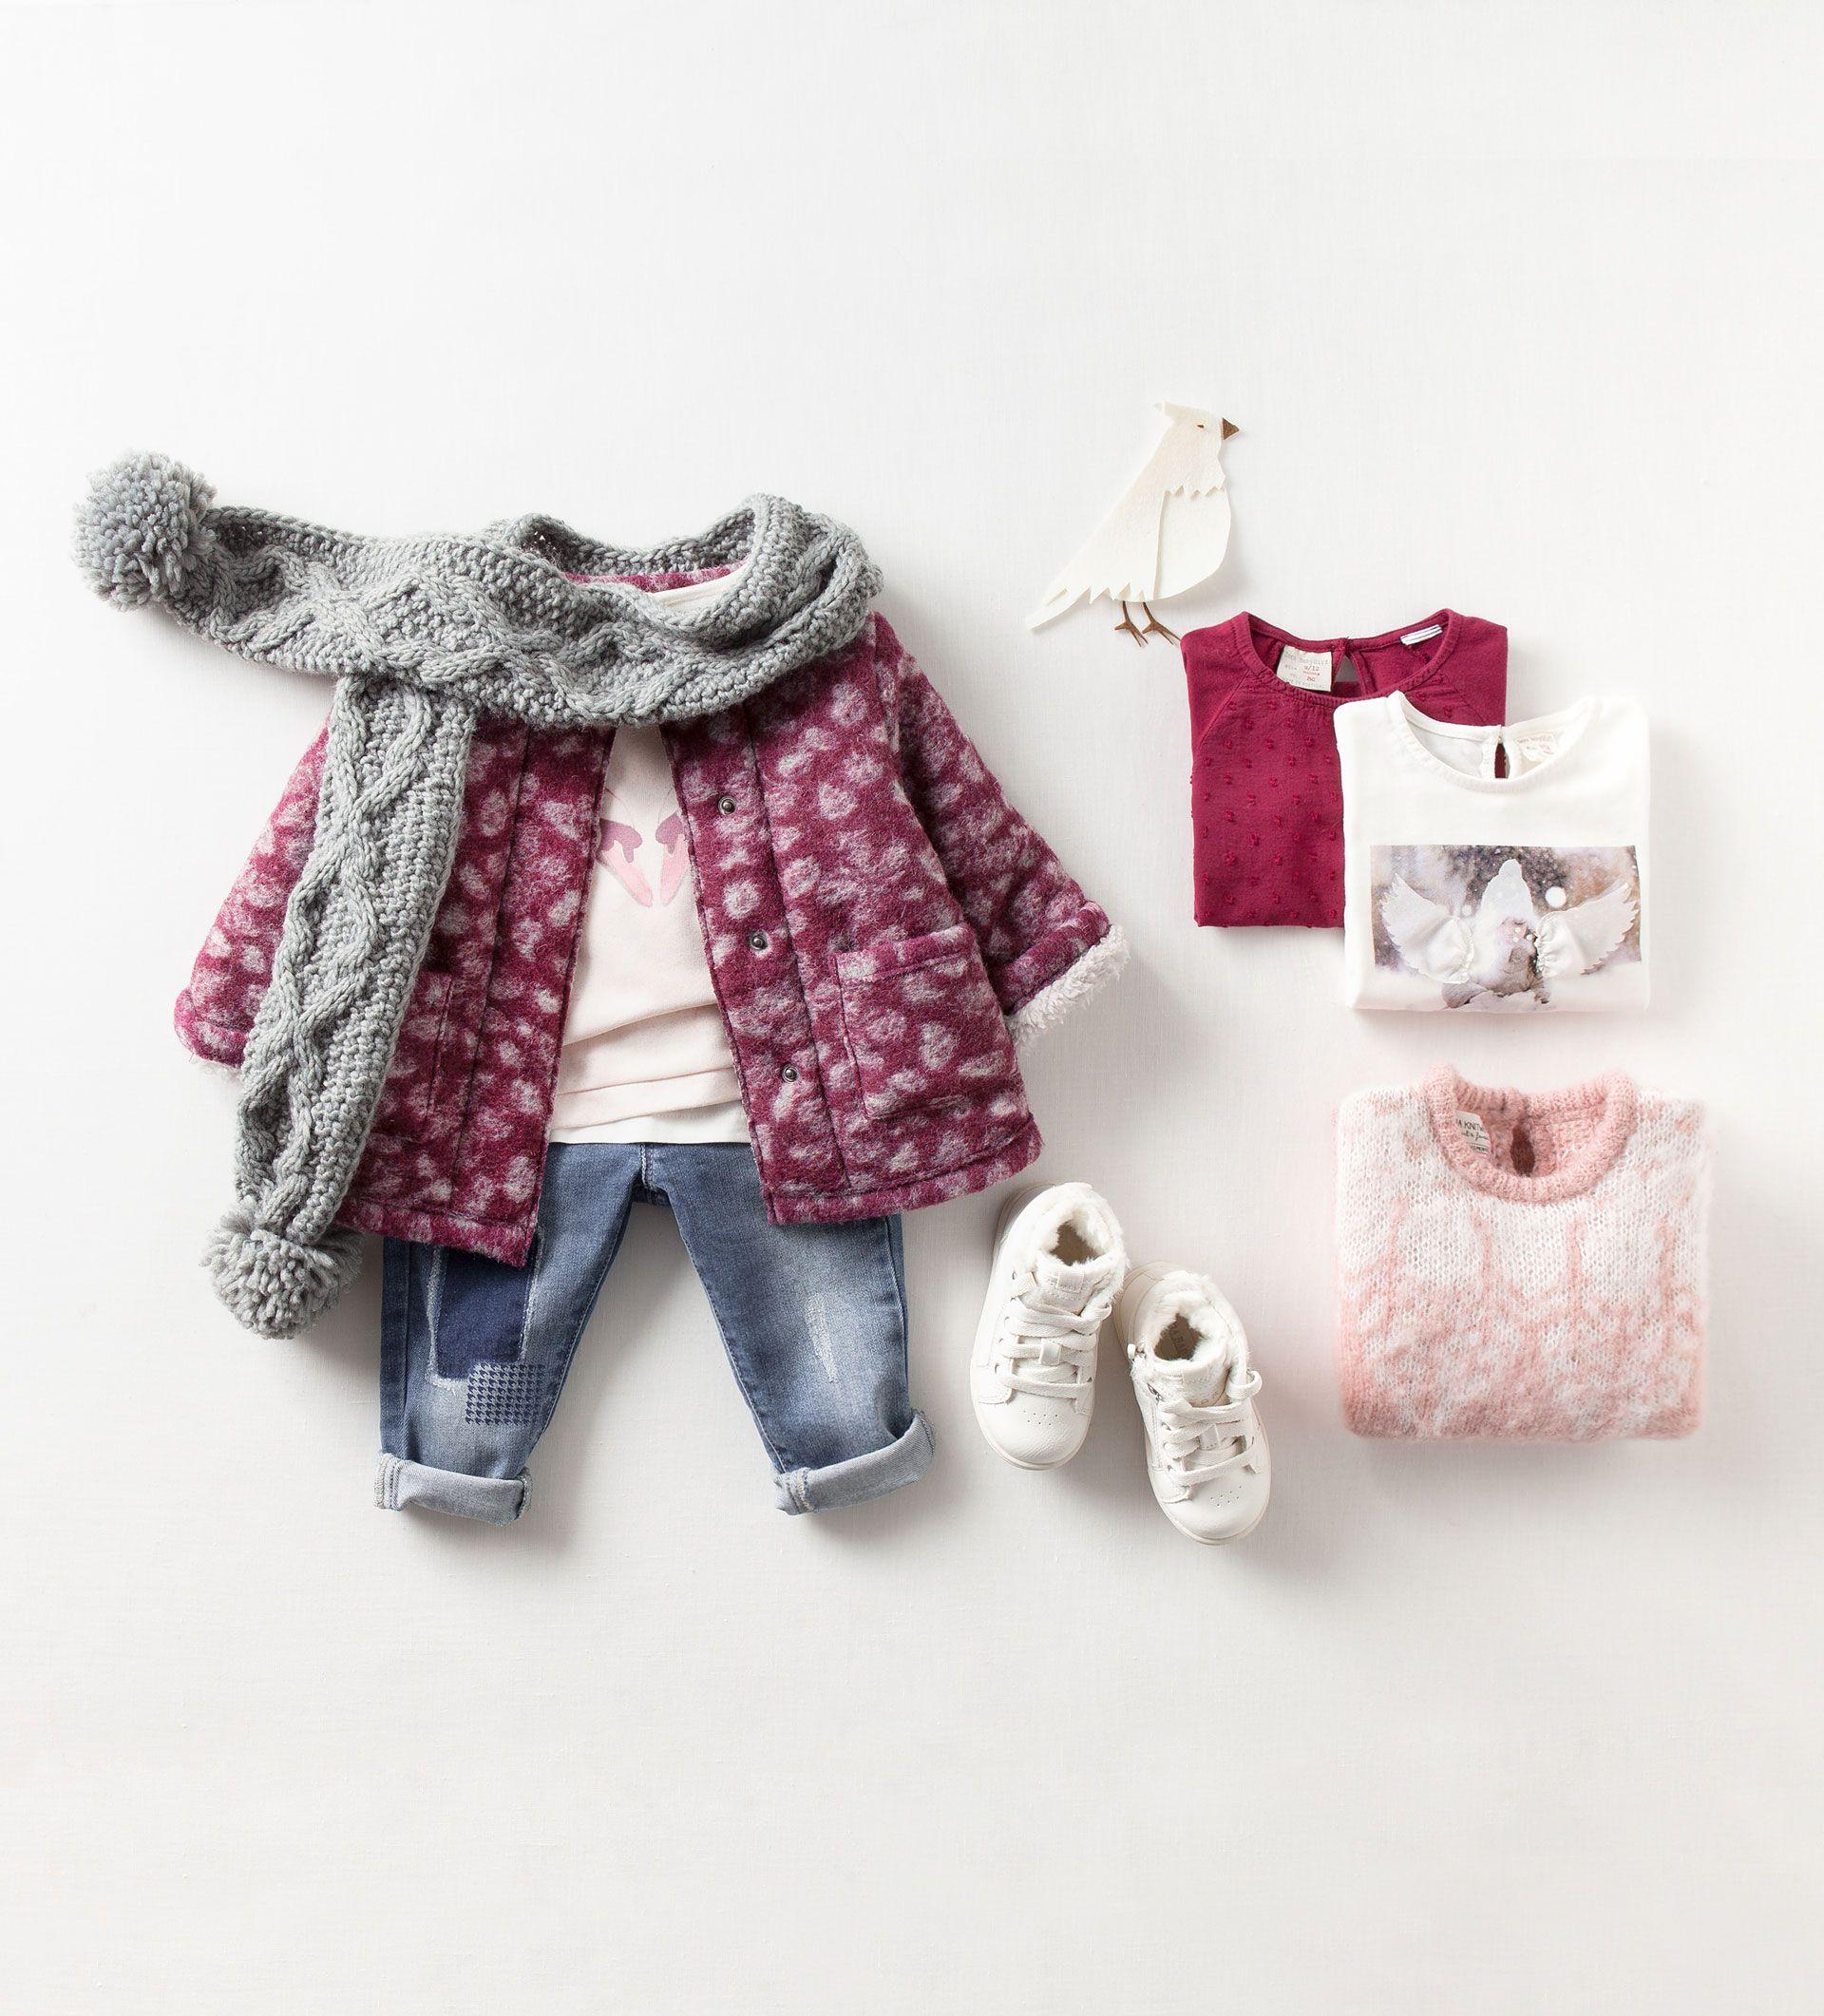 precio competitivo comprar oficial precio al por mayor Zara Baby Girls Outfit | Tiny Fashion | Ropa bebe niña, Moda ...